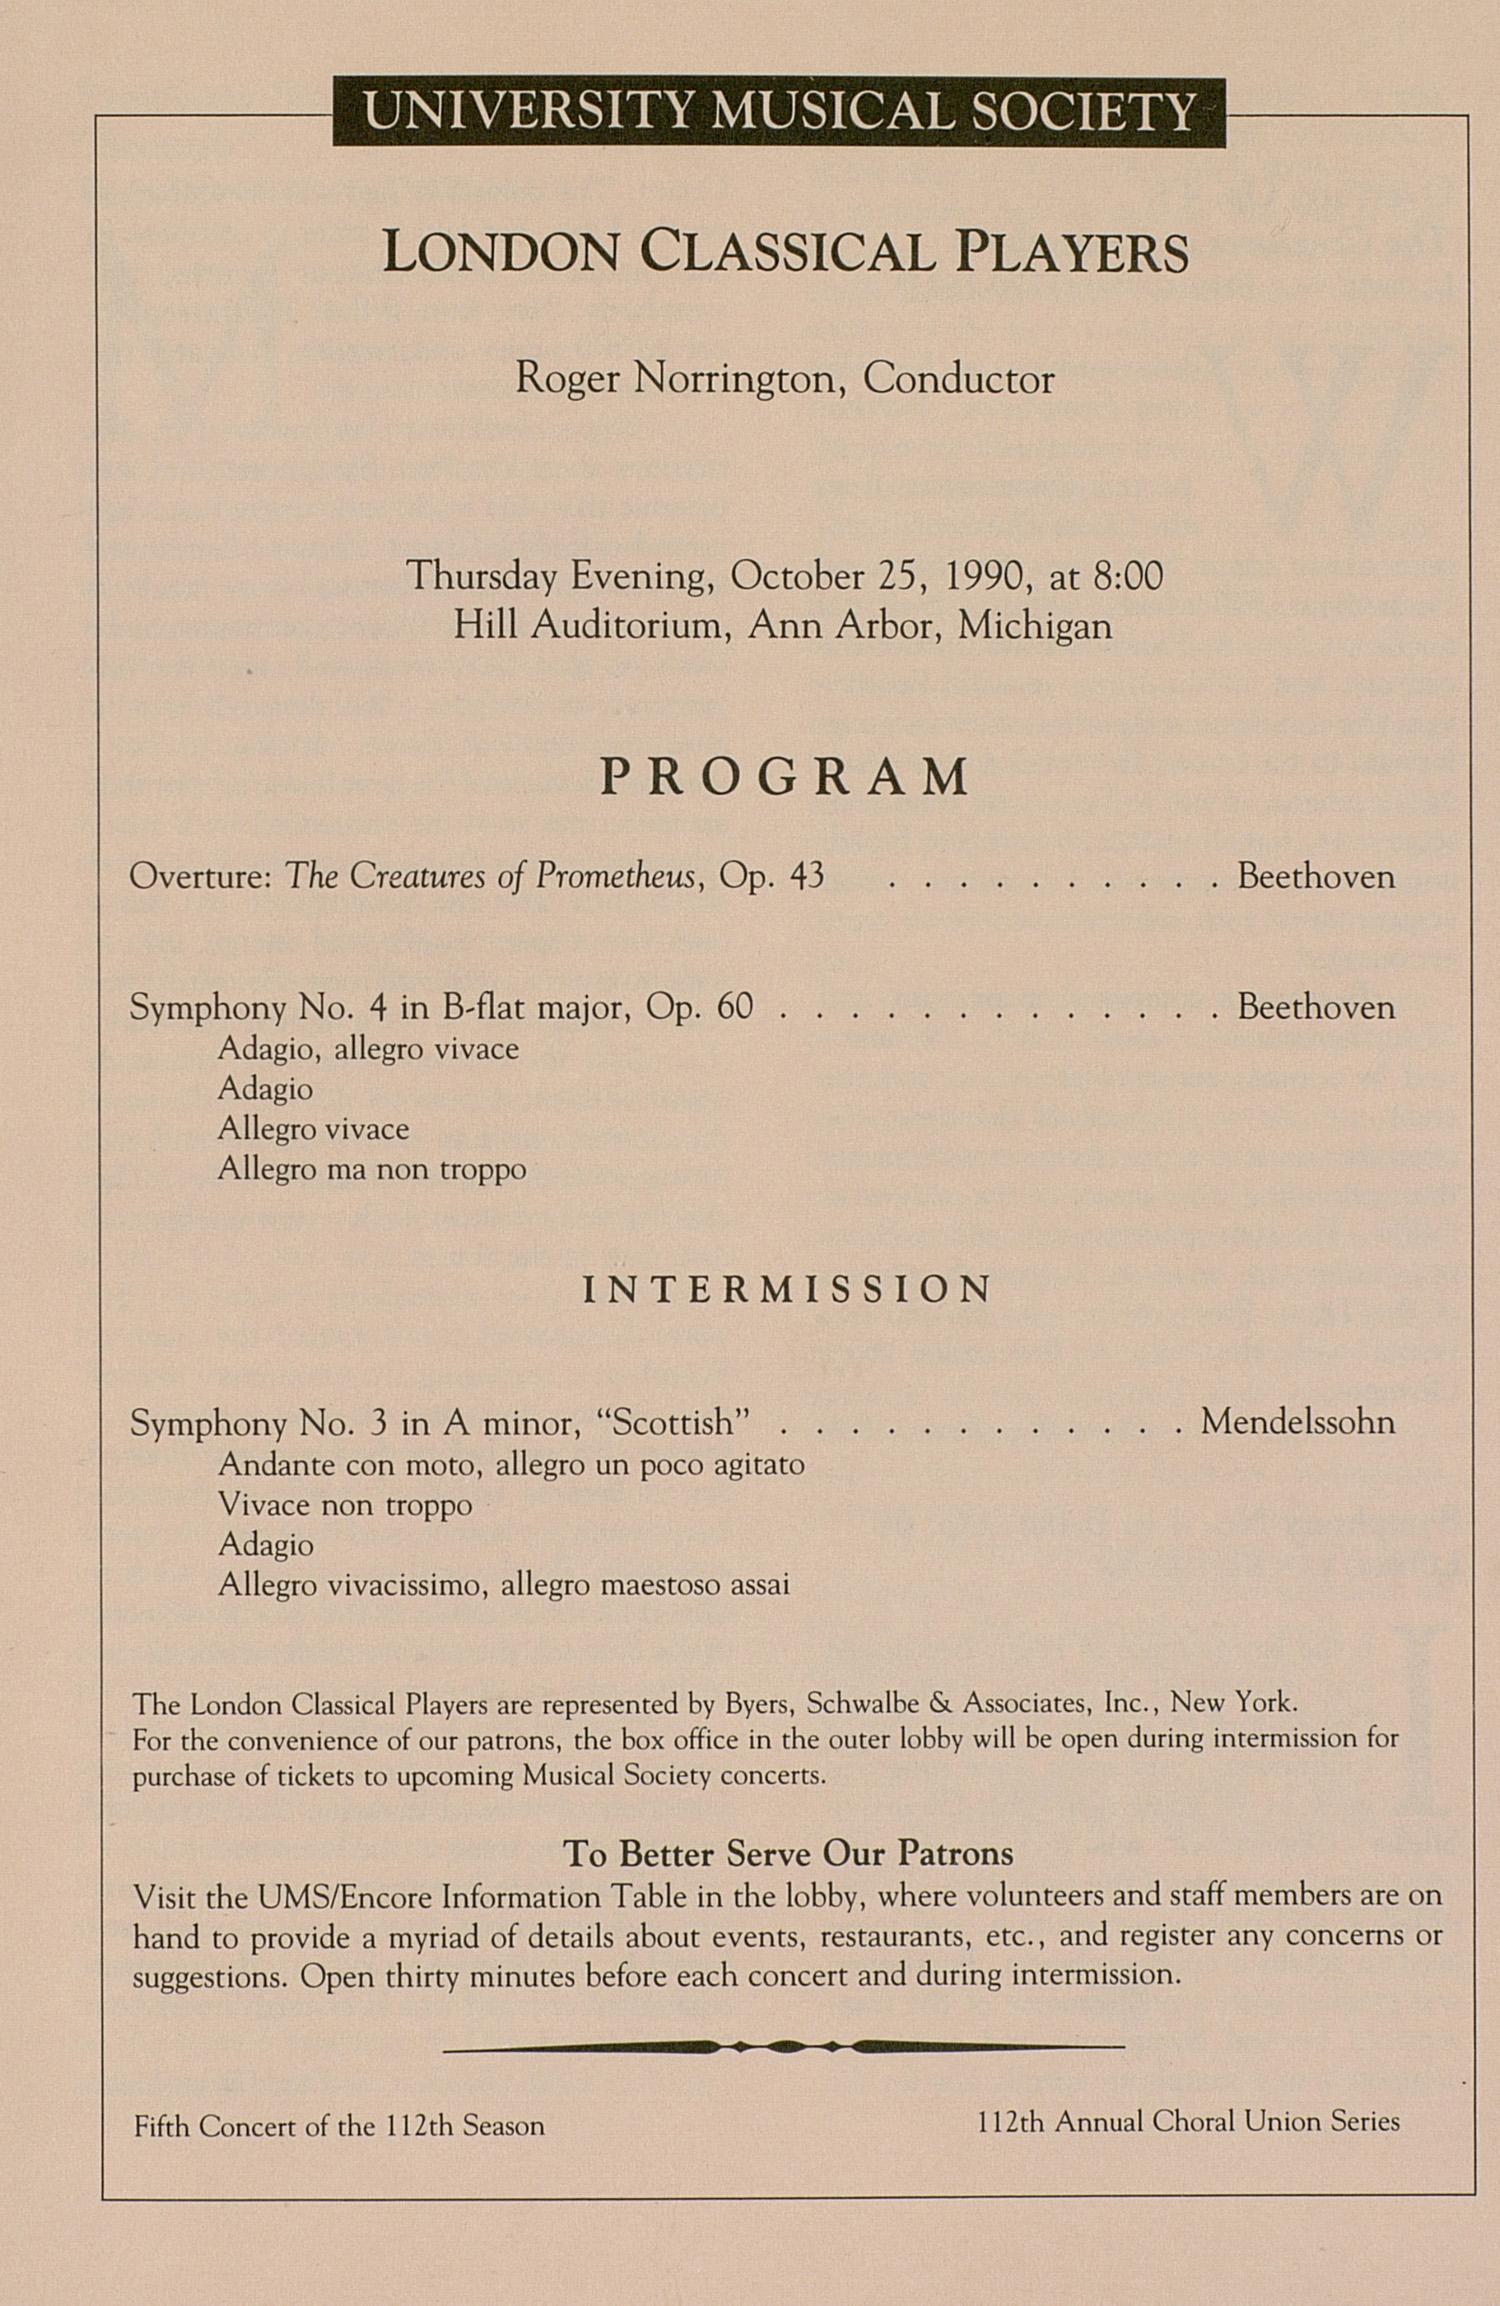 UMS Concert Program October 25 1990 London Classical Players – Concert Program